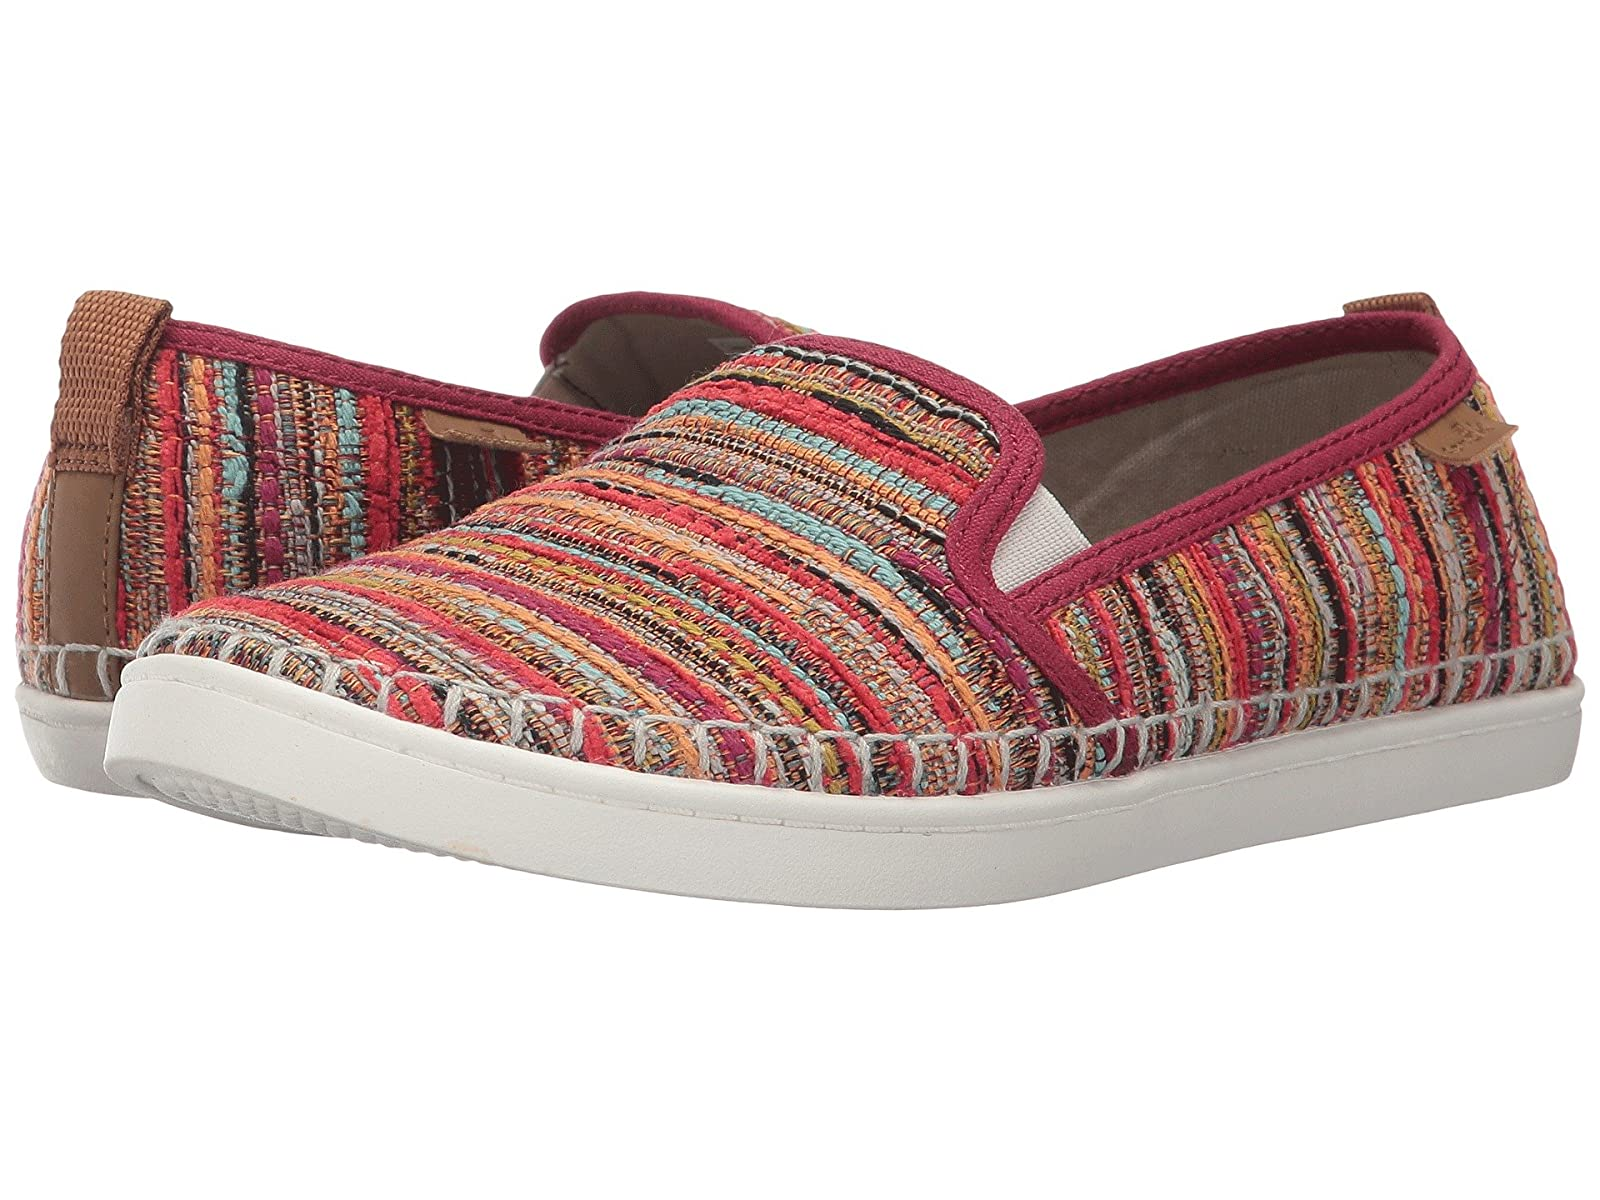 Sanuk Brook TXCheap and distinctive eye-catching shoes